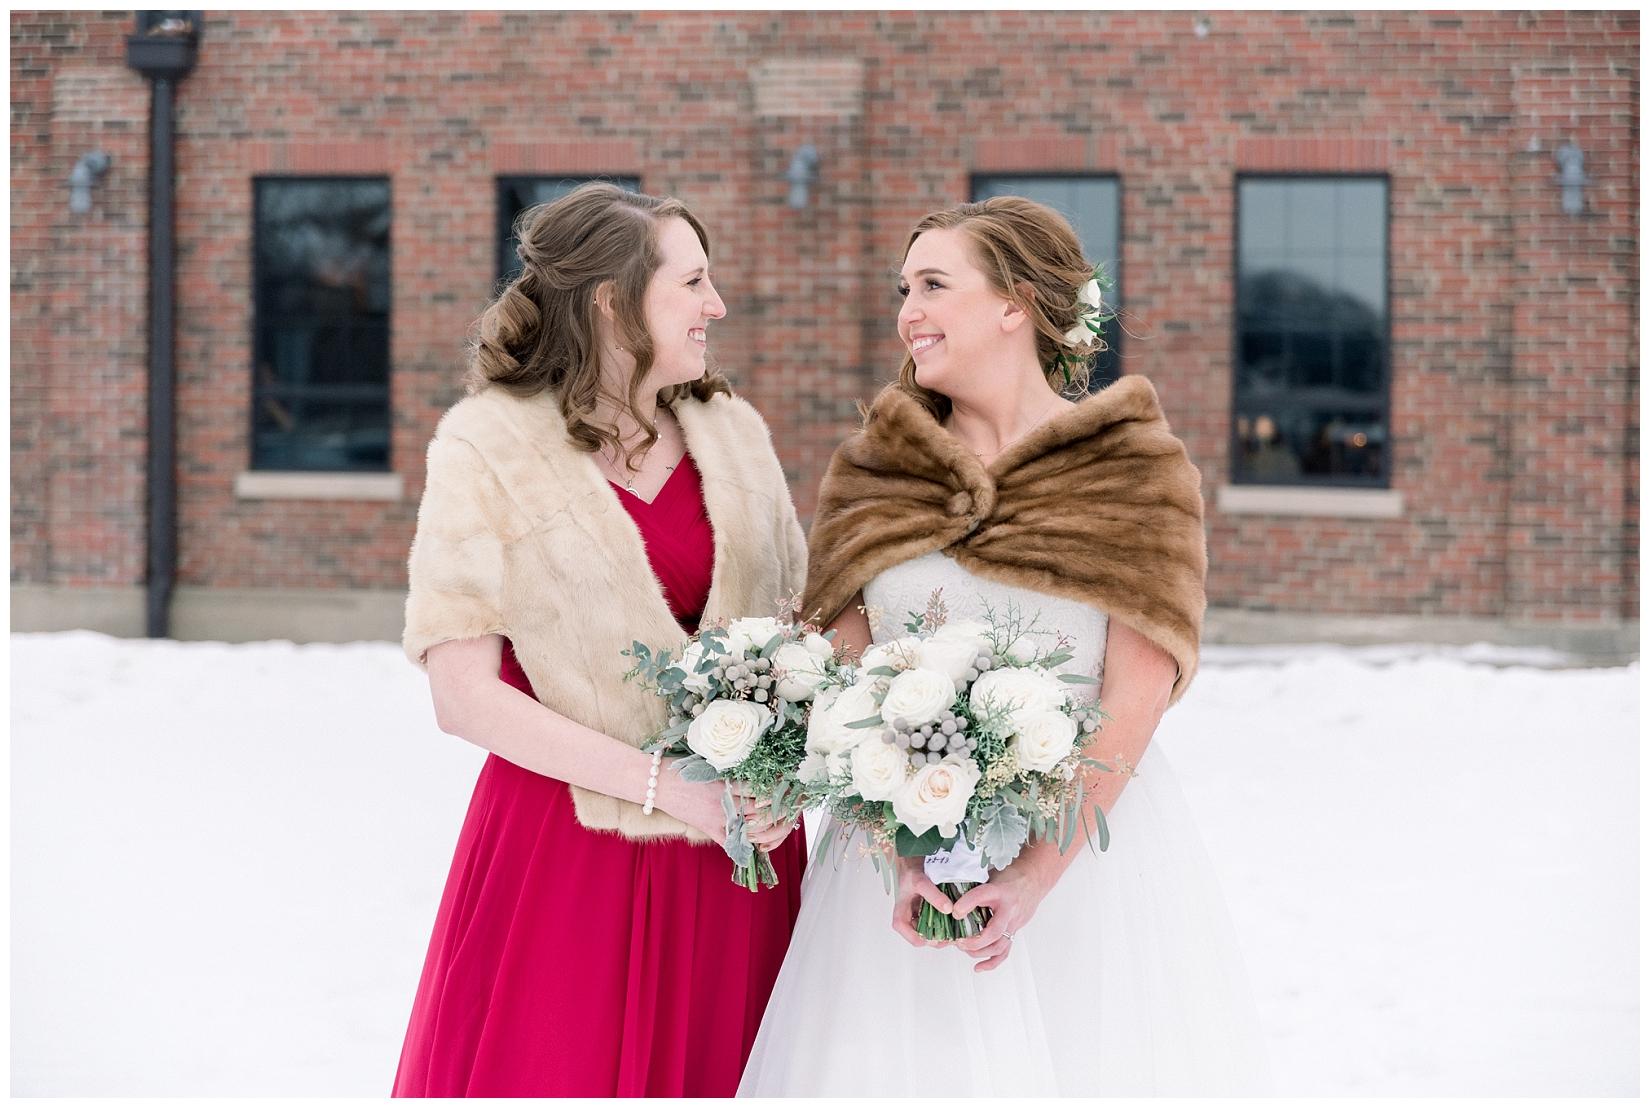 cat-alkire-wedding-photographer-indiana-chicago-indianapolis-fort-wayne_0963.jpg